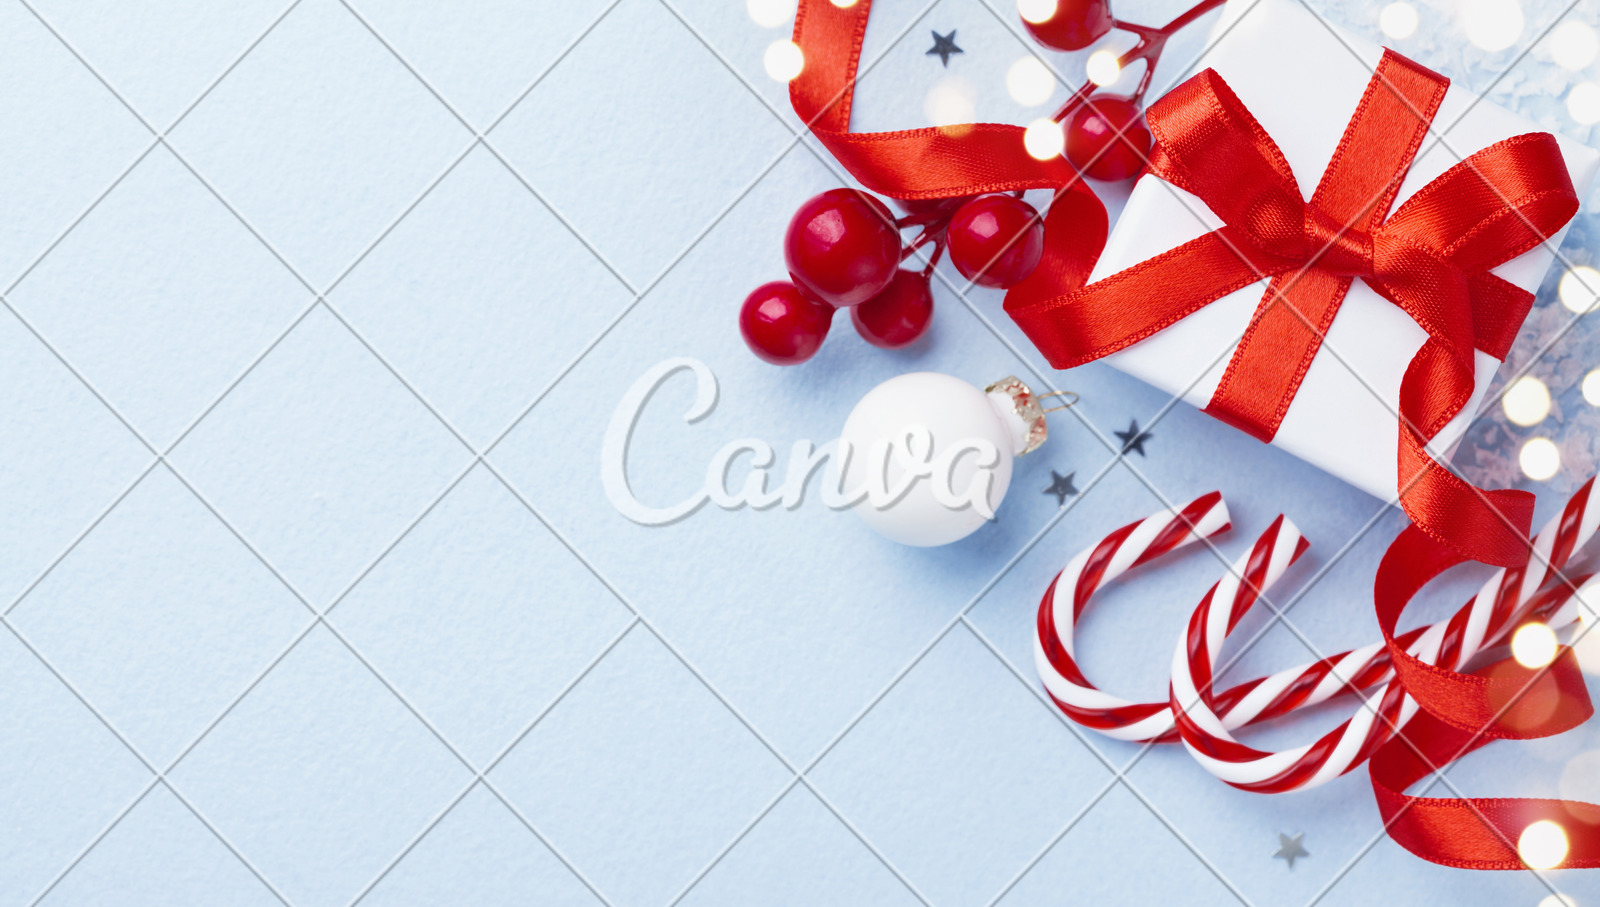 Christmas Card Or Banner Christmas Gift Box And Decorations